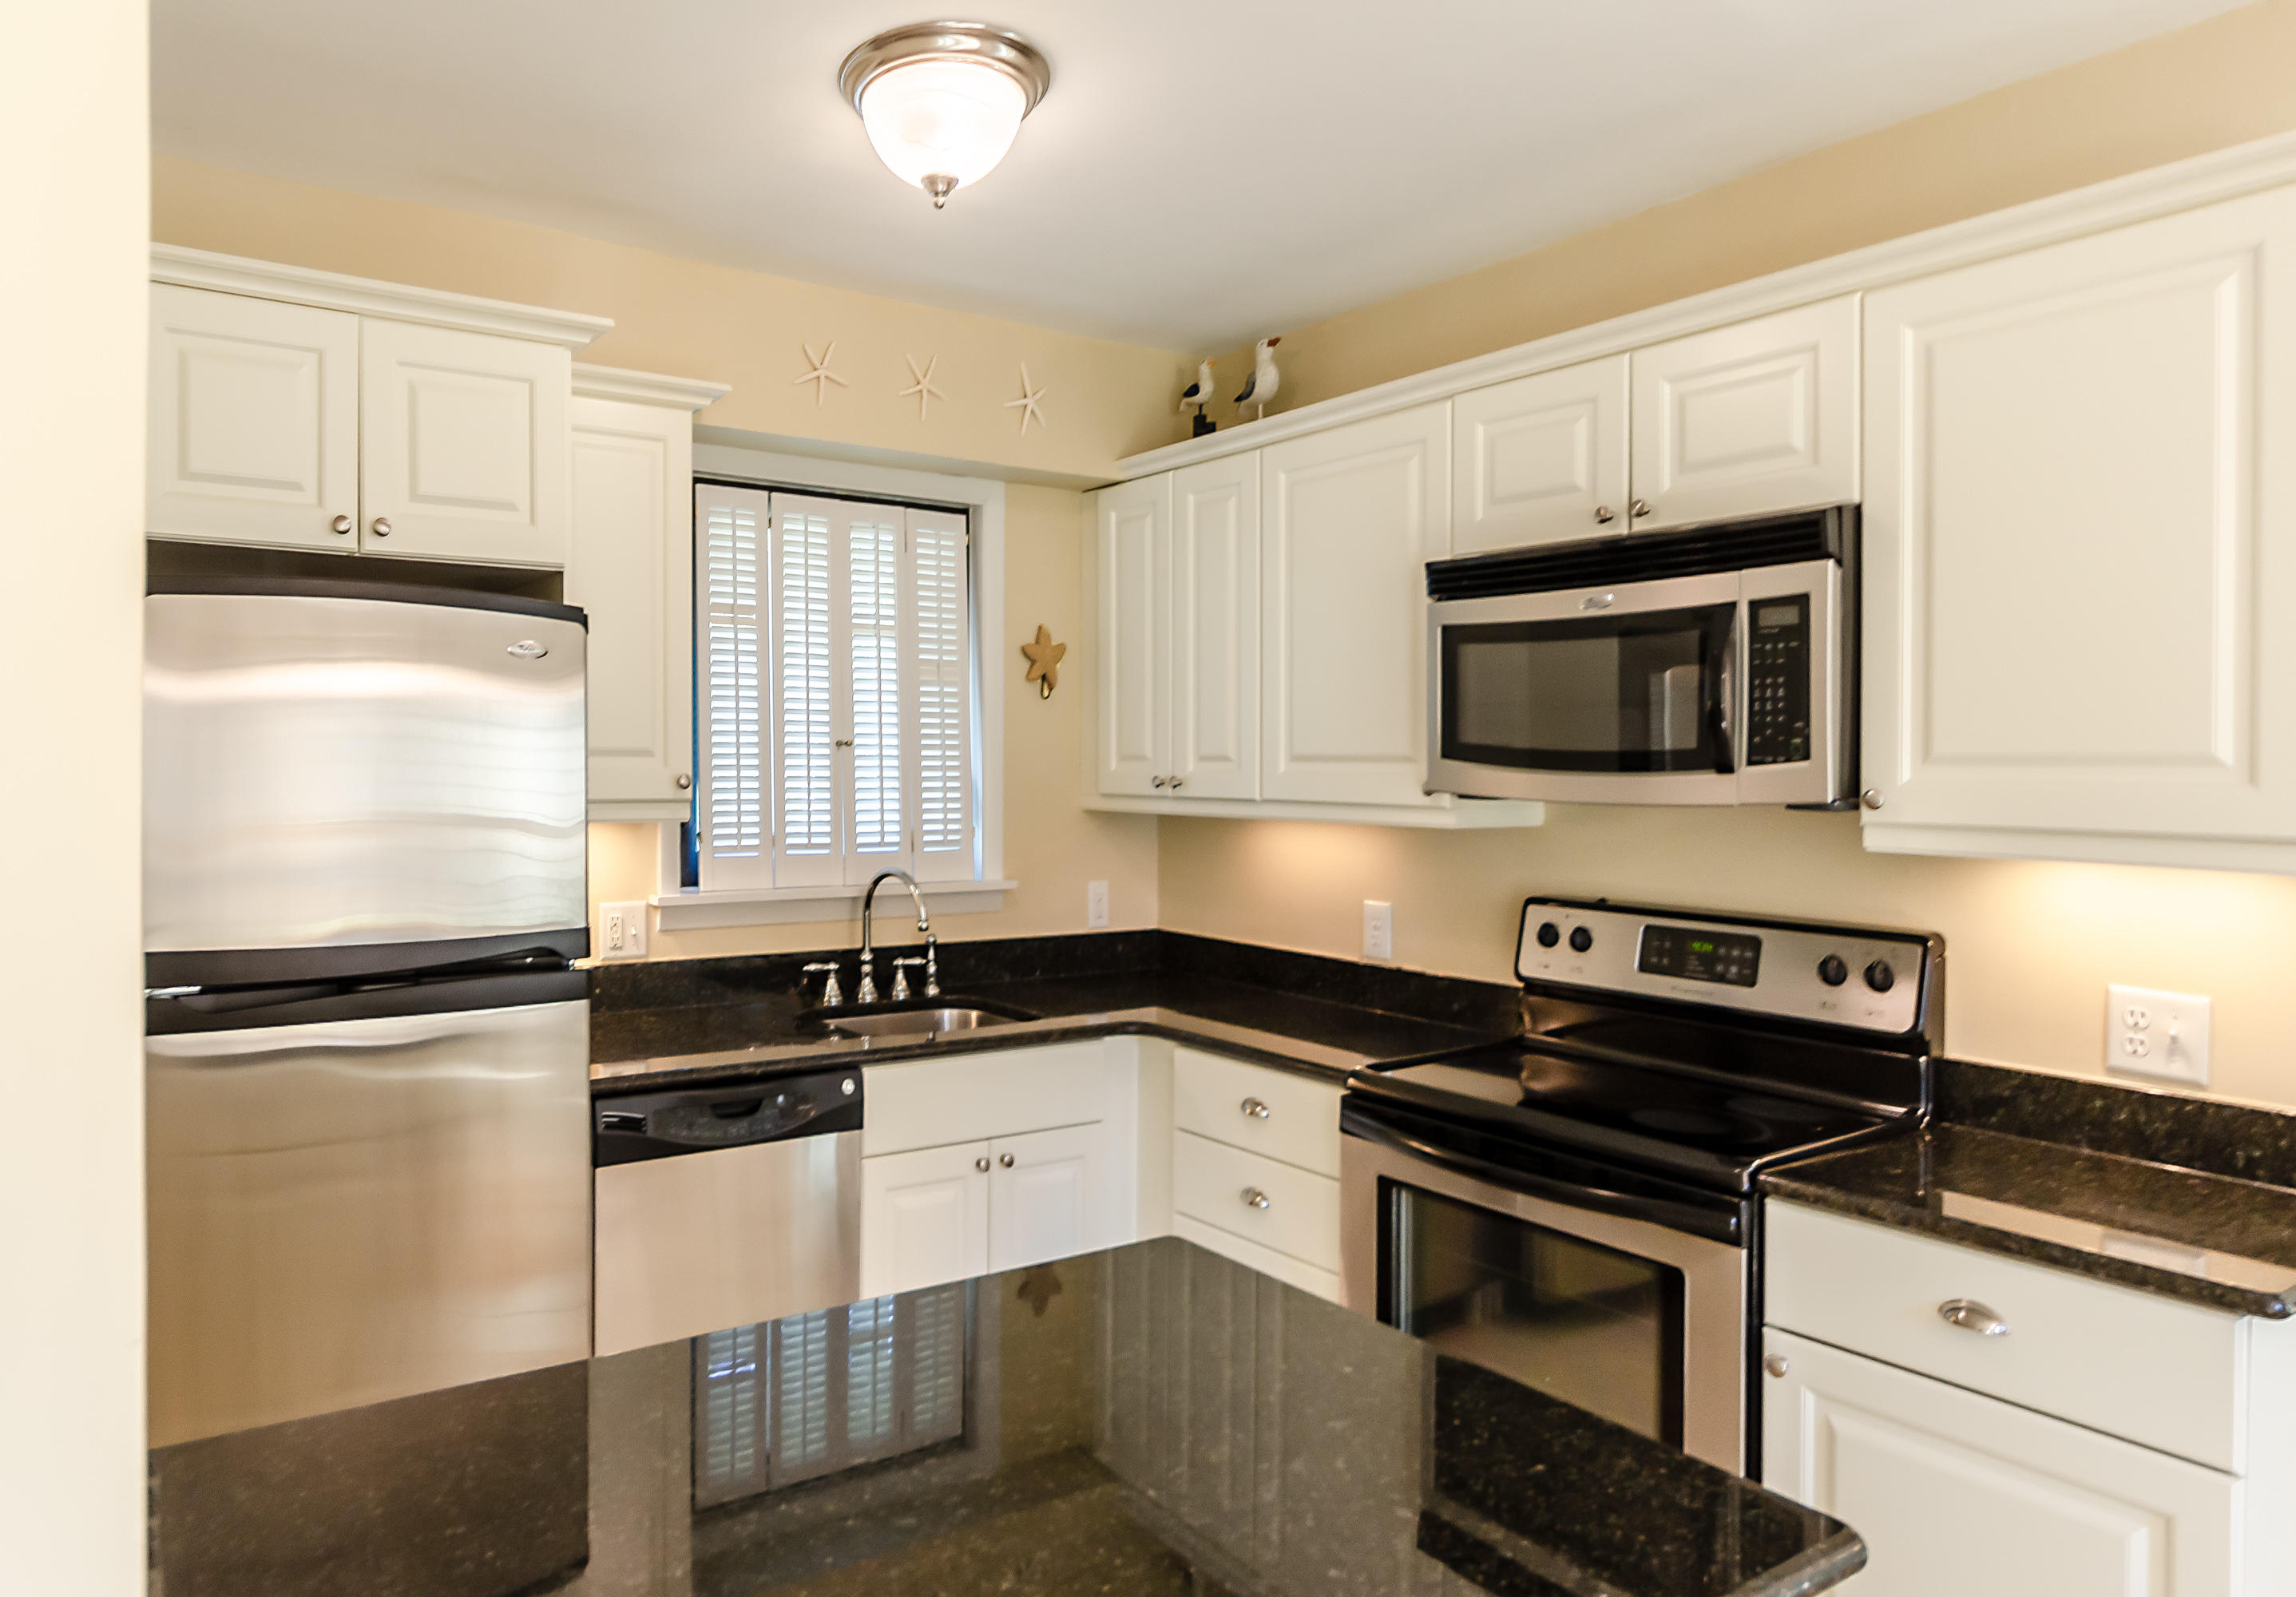 Seabrook Island Homes For Sale - 122 High Hammock Villa, Seabrook Island, SC - 18